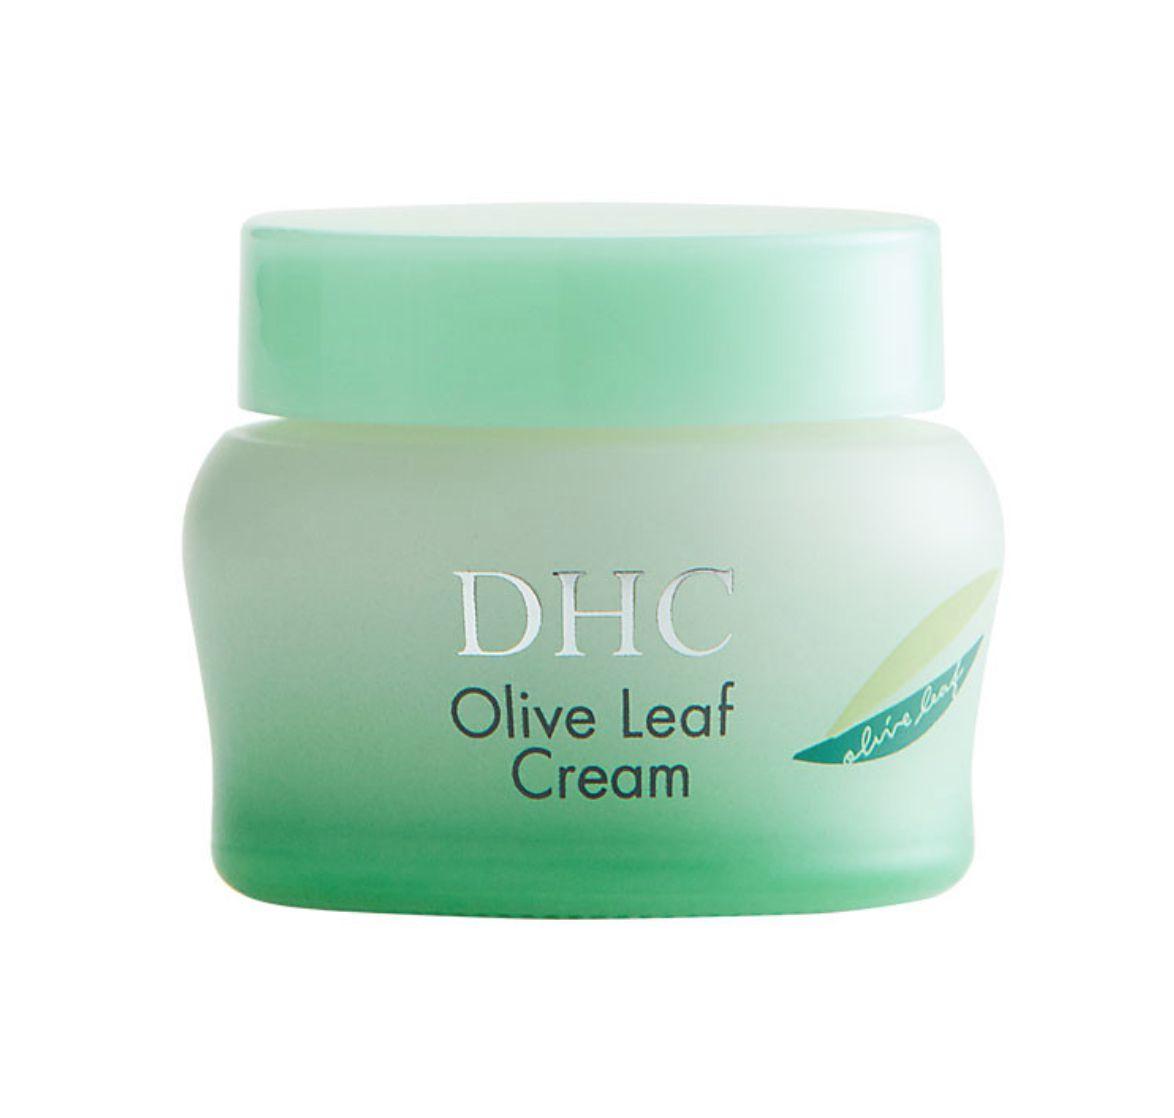 DHC olive leaf cream